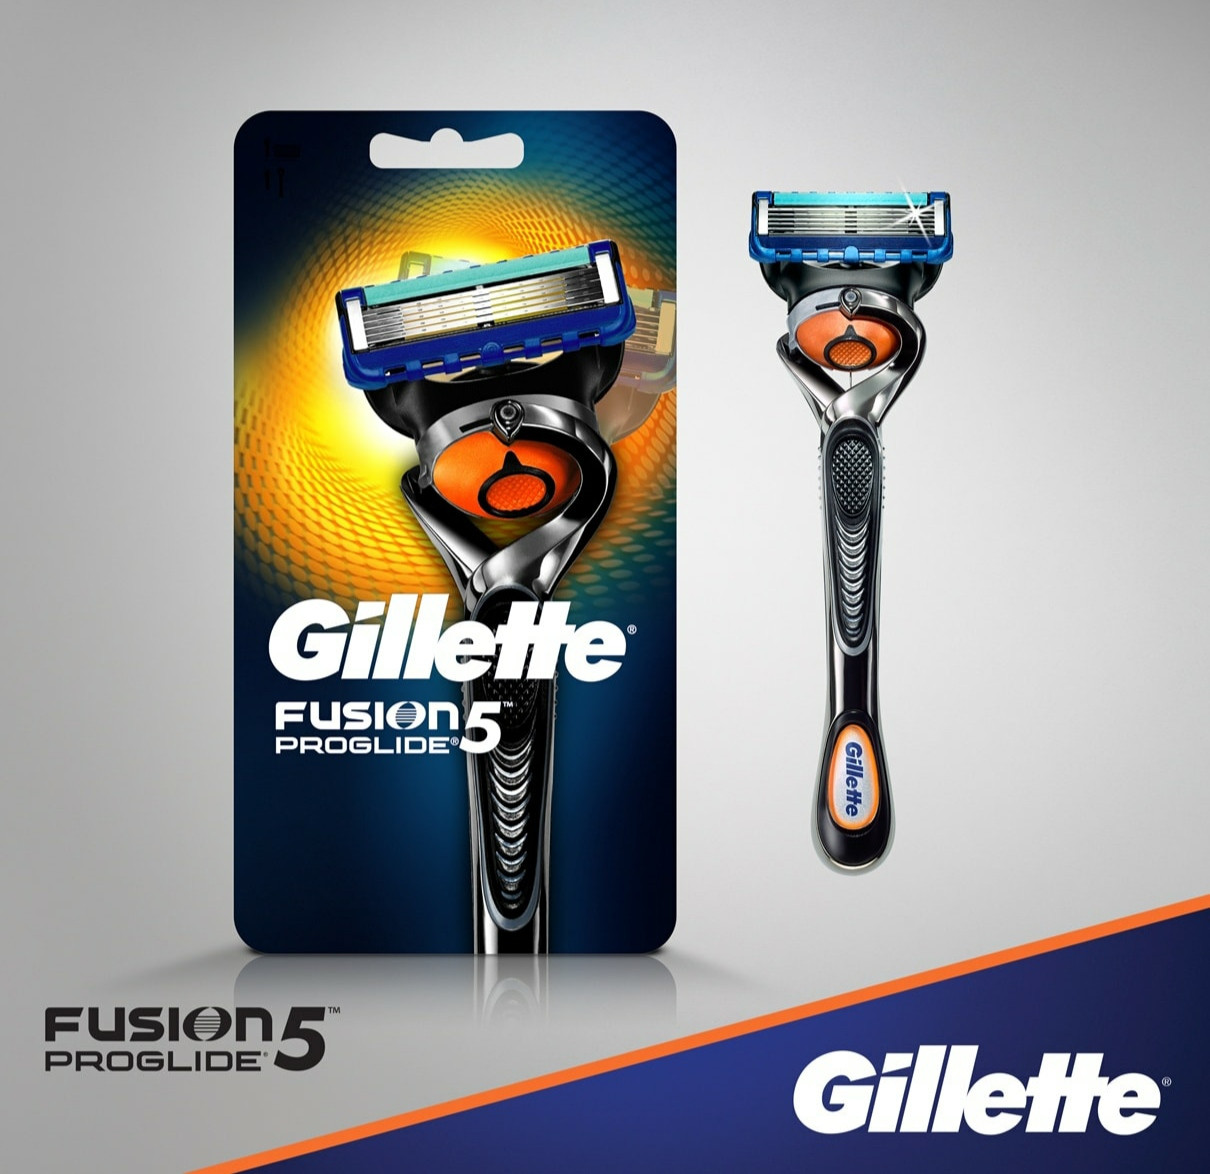 Бритвений станок GILLETTE FUSION 5 PROGLIDE FLEXBALL Жилет Ф'южн 5 Проглайд